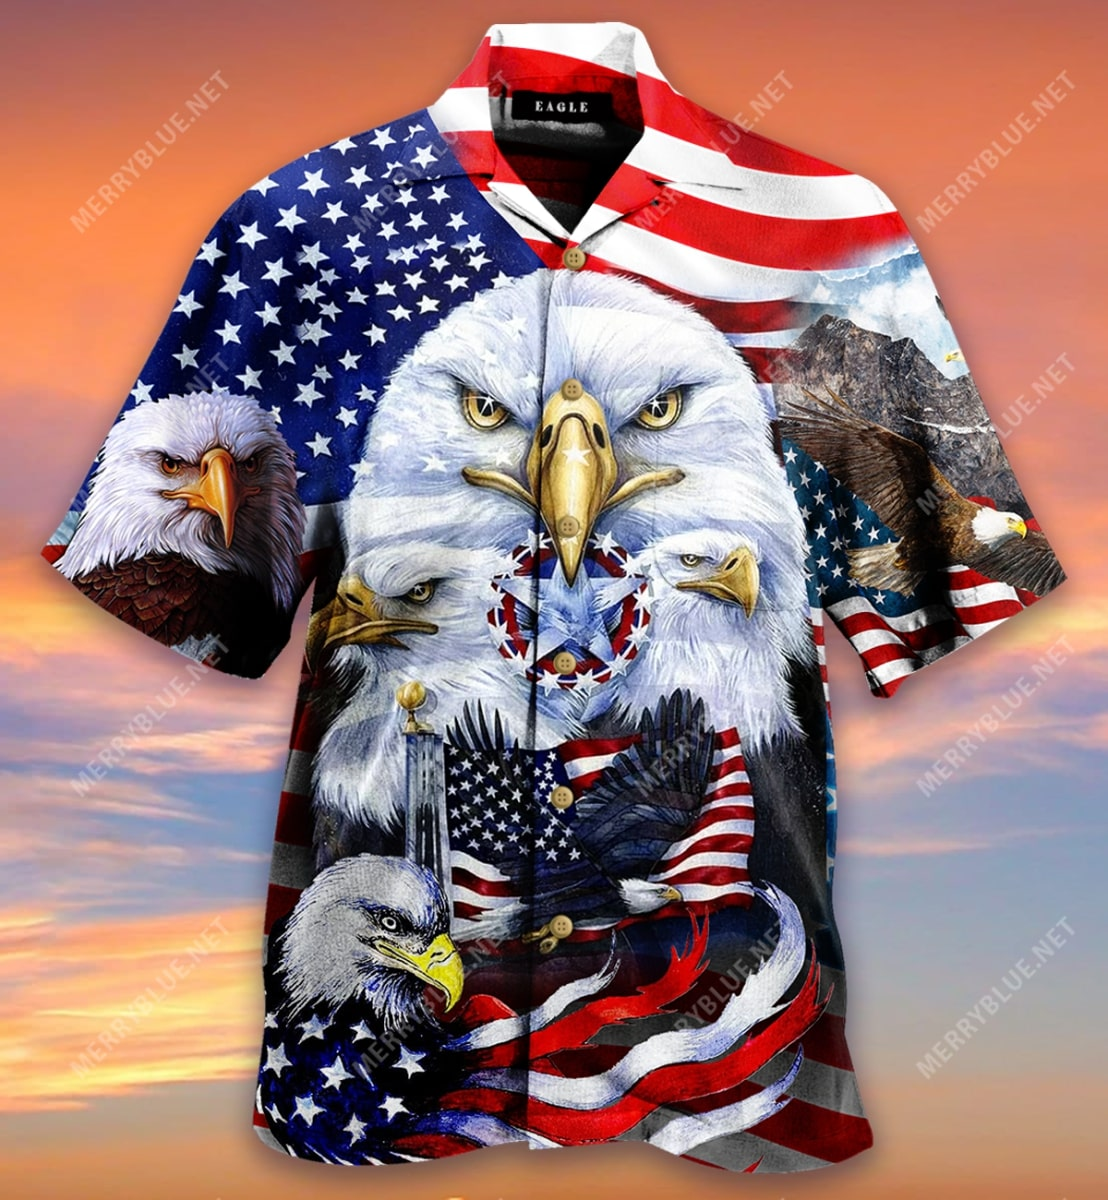 eagles patriotic american flag all over printed hawaiian shirt 2